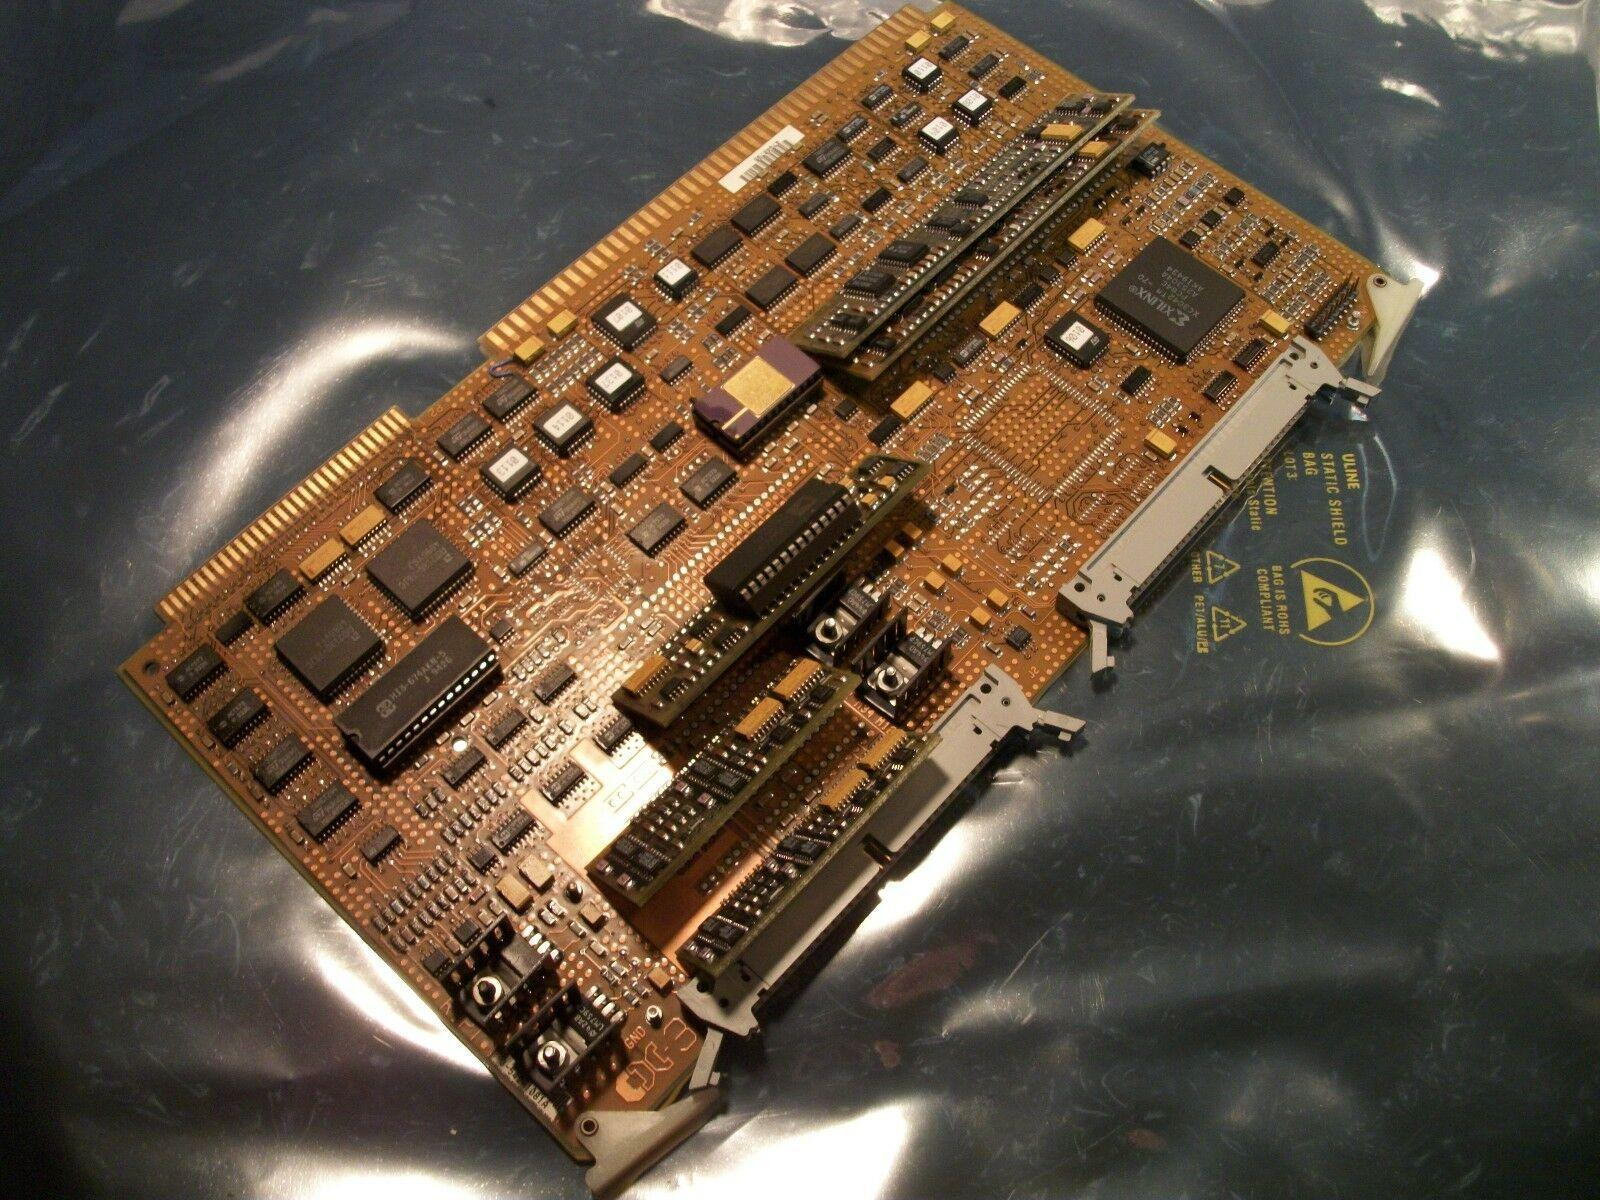 Cincinnati Milacron Siemens CNC Control Circuit Board 3-542-1081A